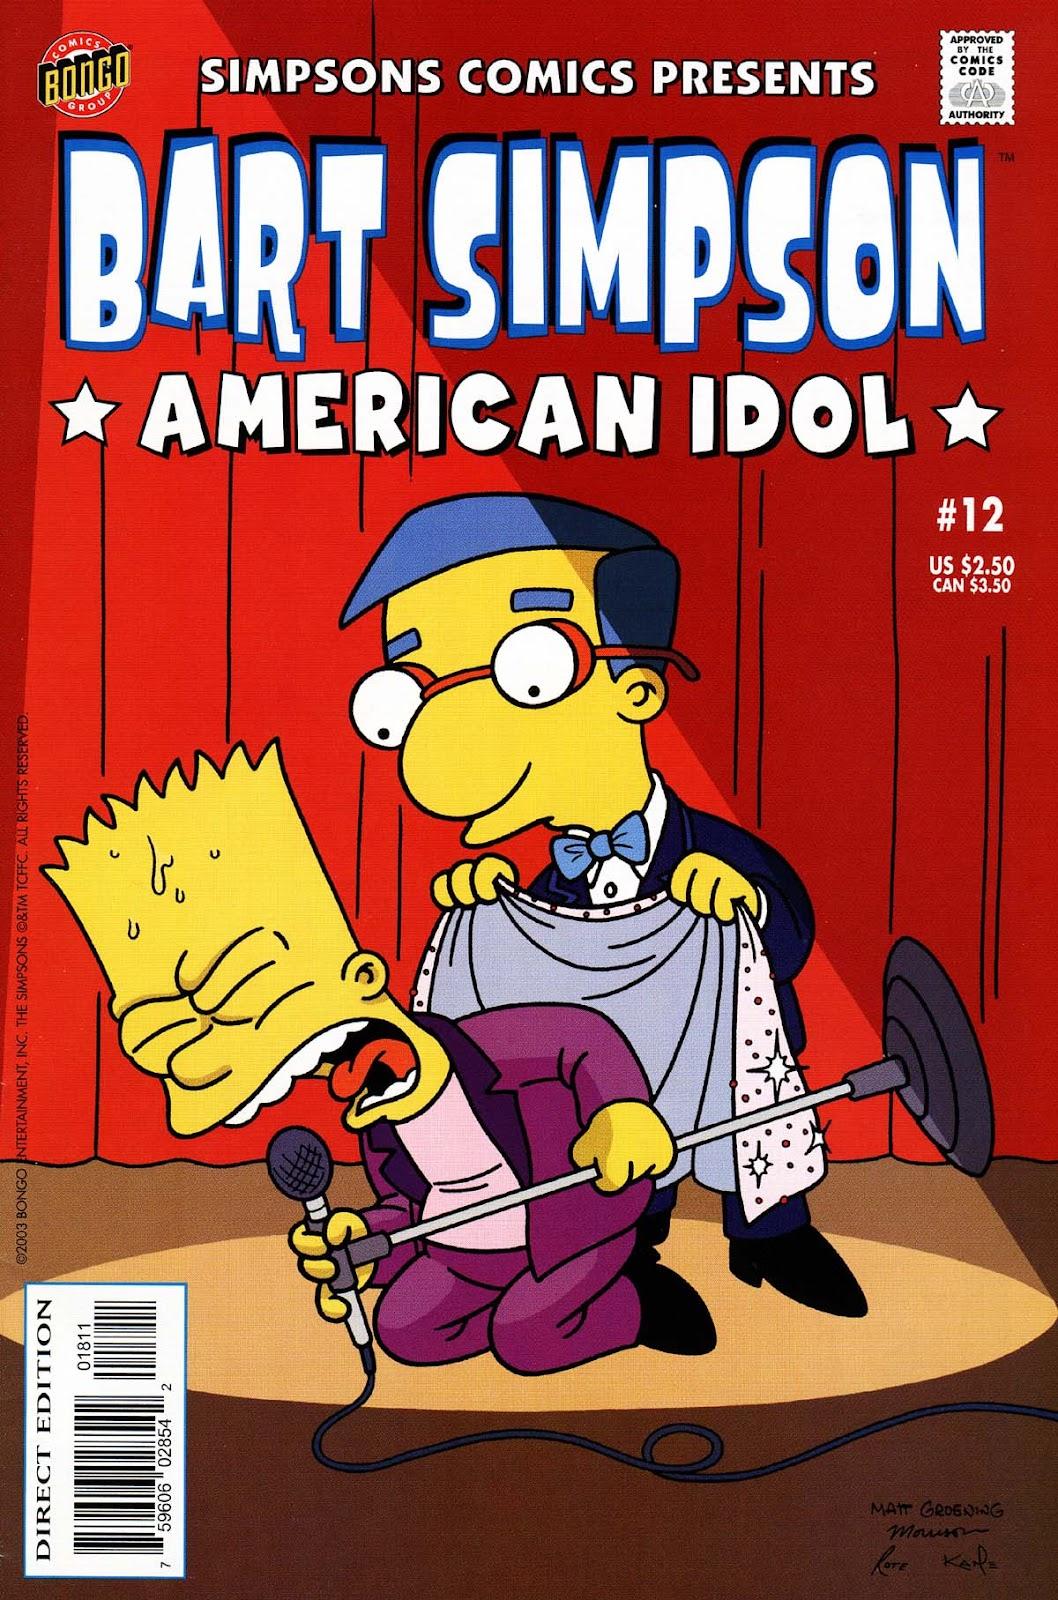 Simpsons Comics Presents Bart Simpson 12 Page 1